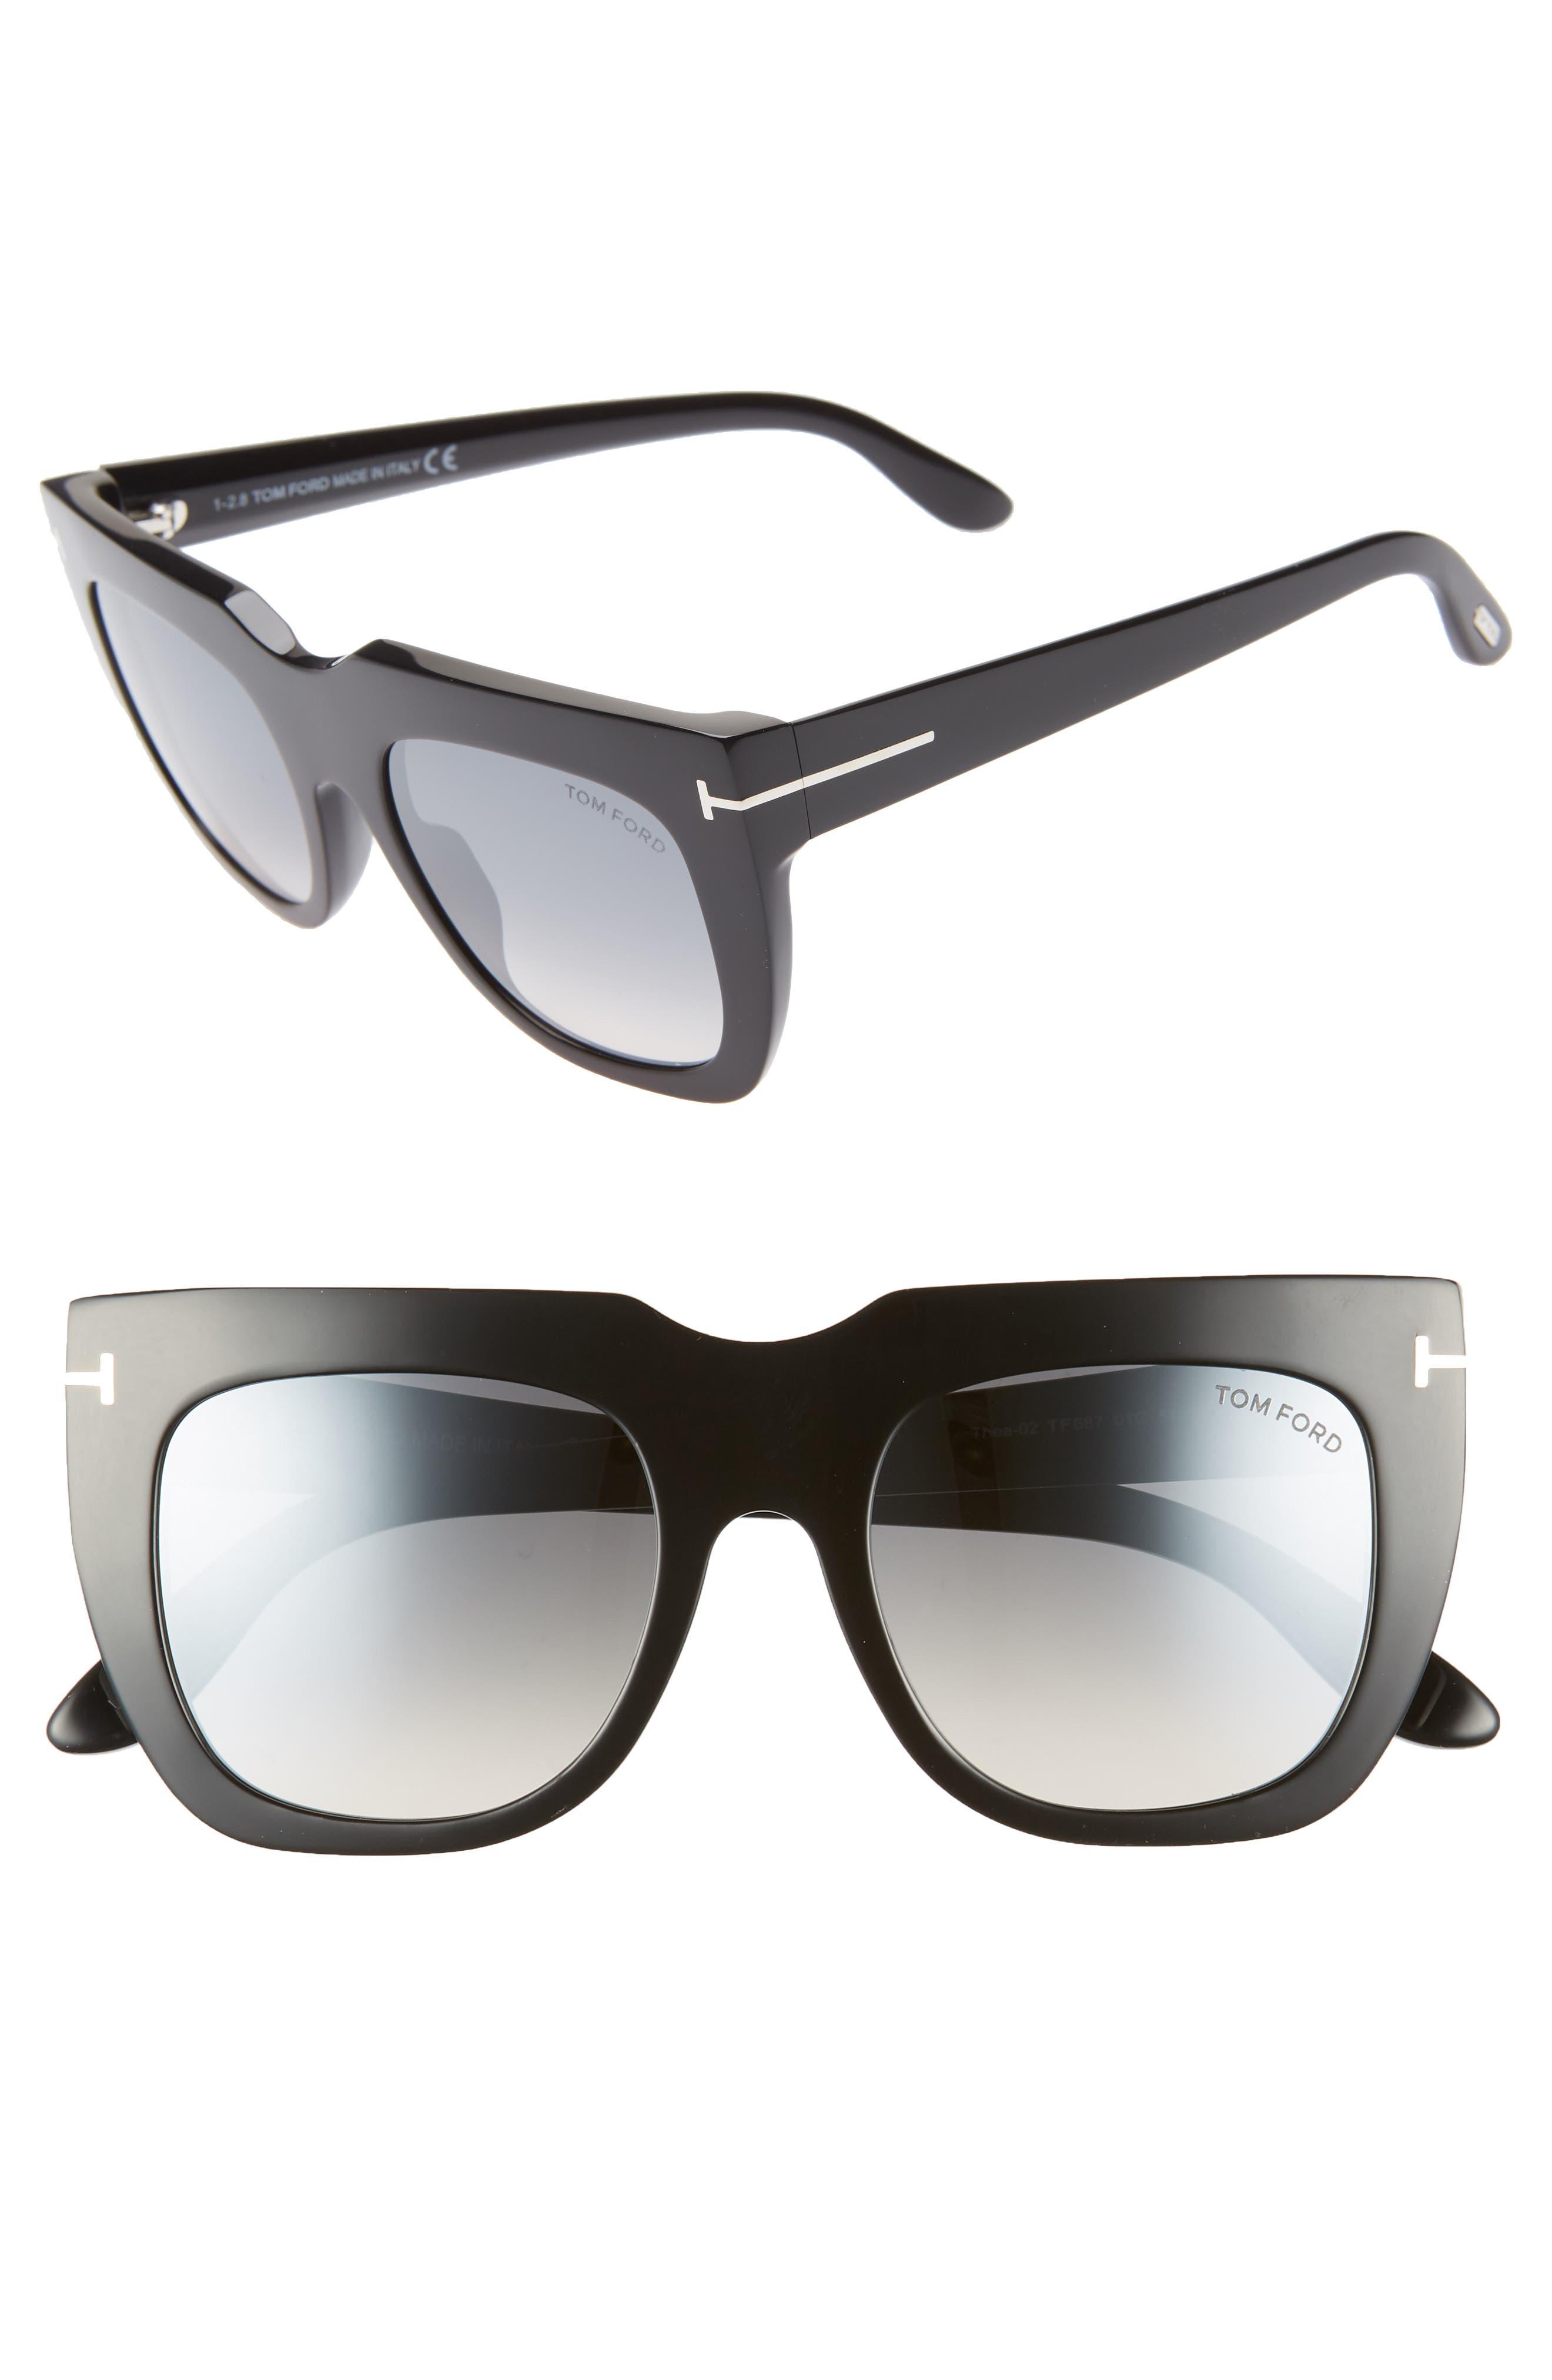 Tom Ford Thea 51Mm Mirrored Cat Eye Glasses - Shiny Black/ Grey W Silver